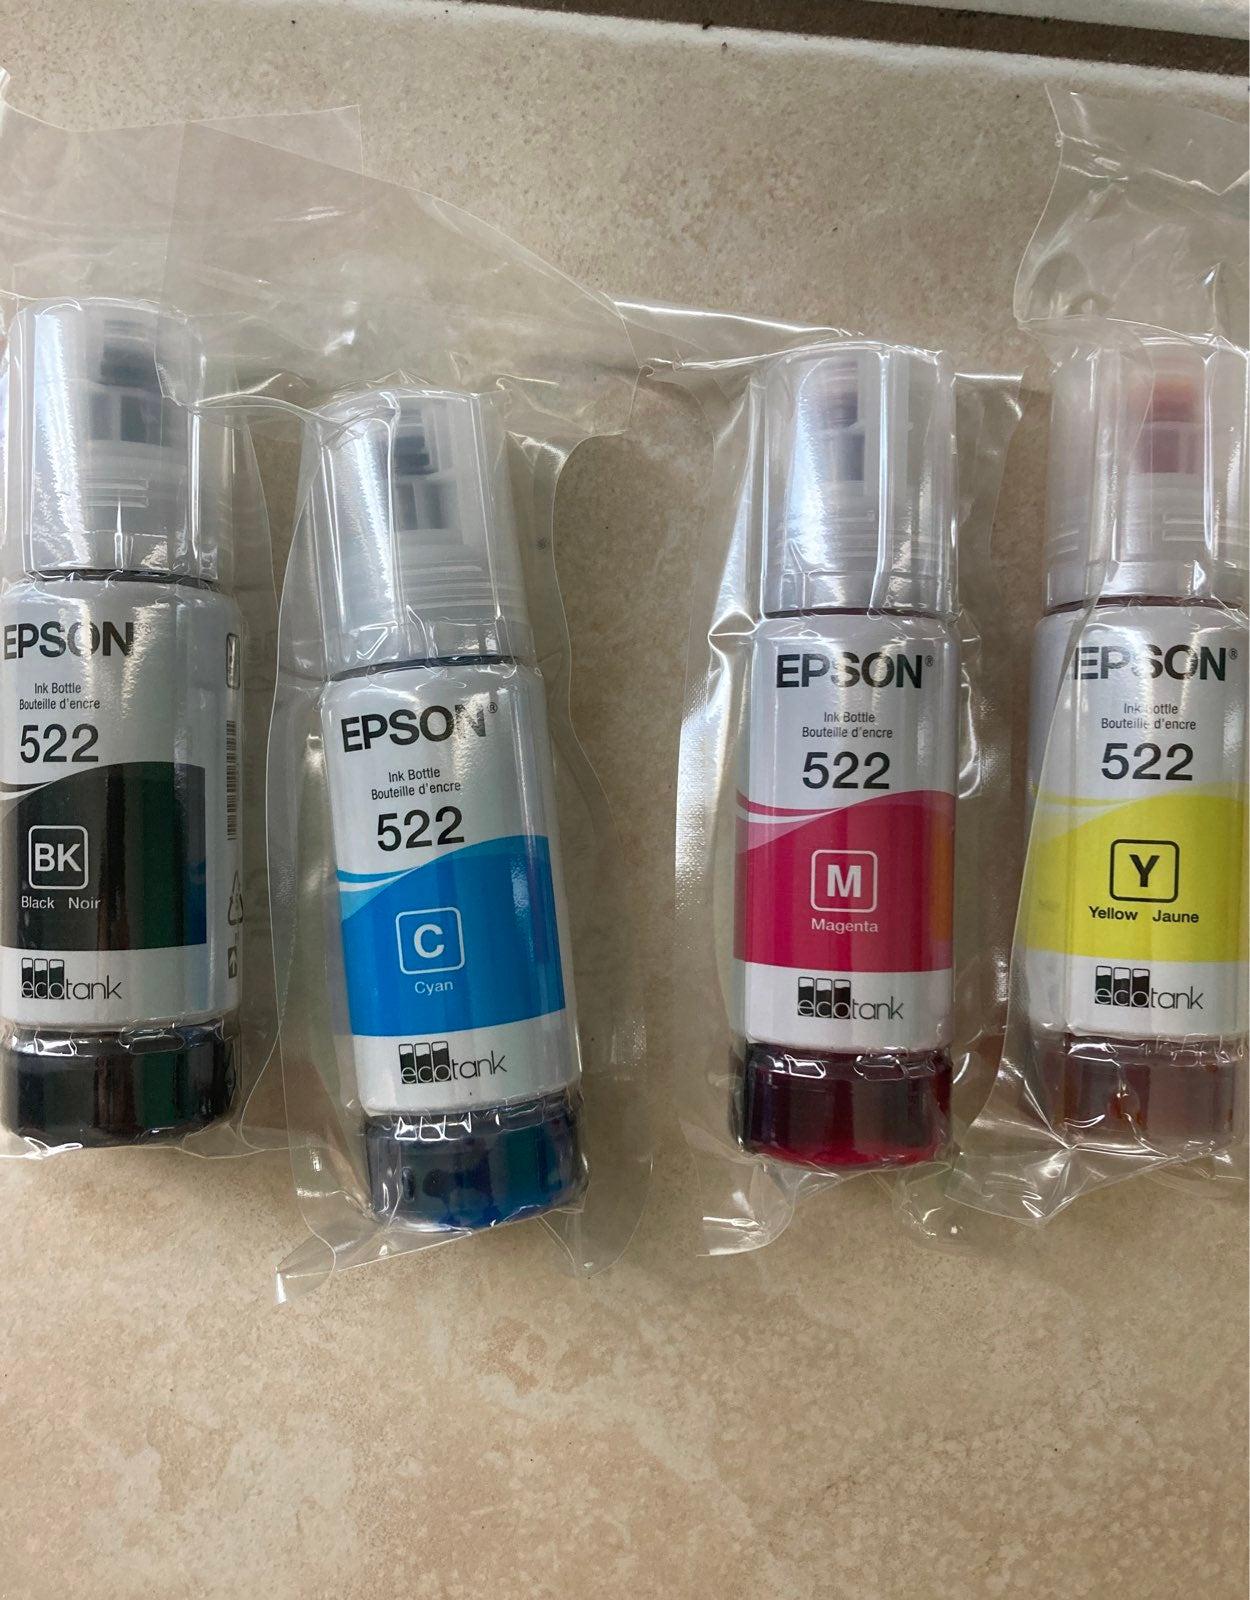 Epson 522 et-2720 EcoTank Printer ink